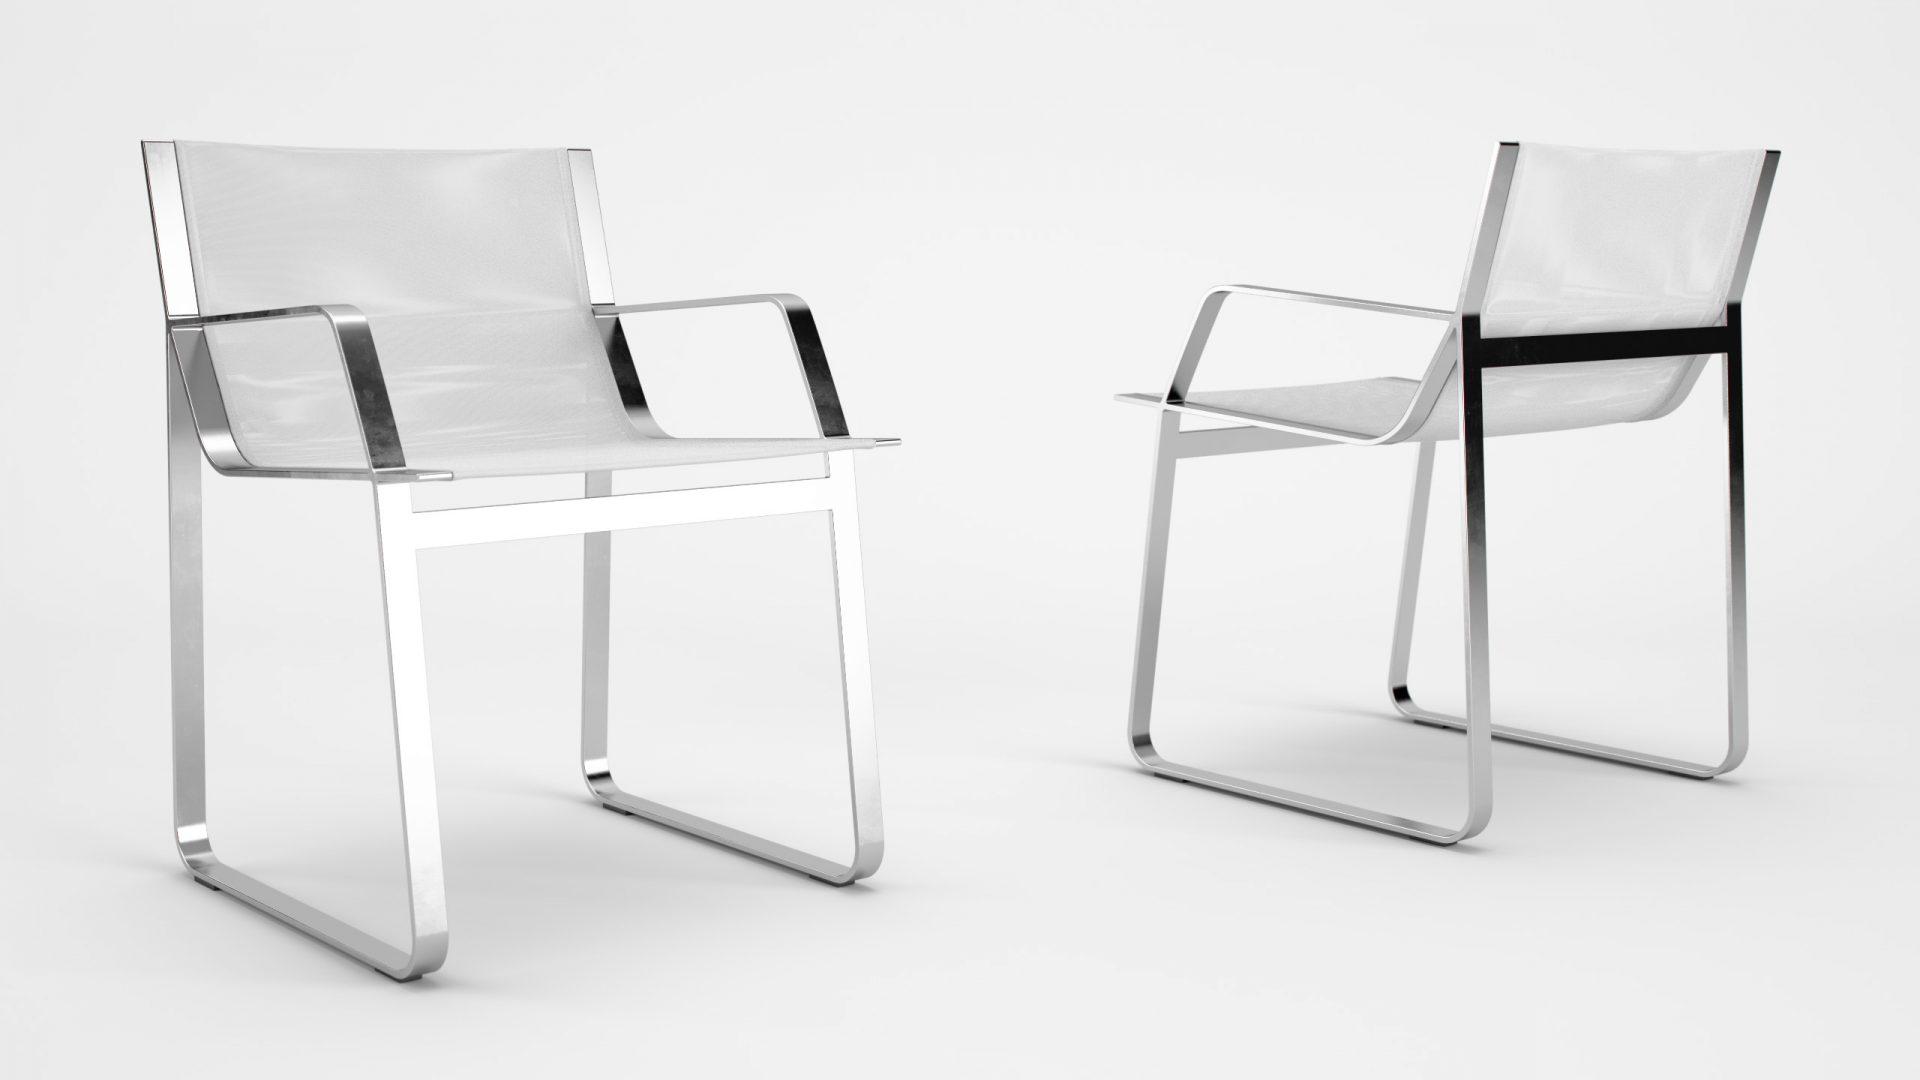 008_Essentiel_Chair_0711E2_WhiteSet_01_0006